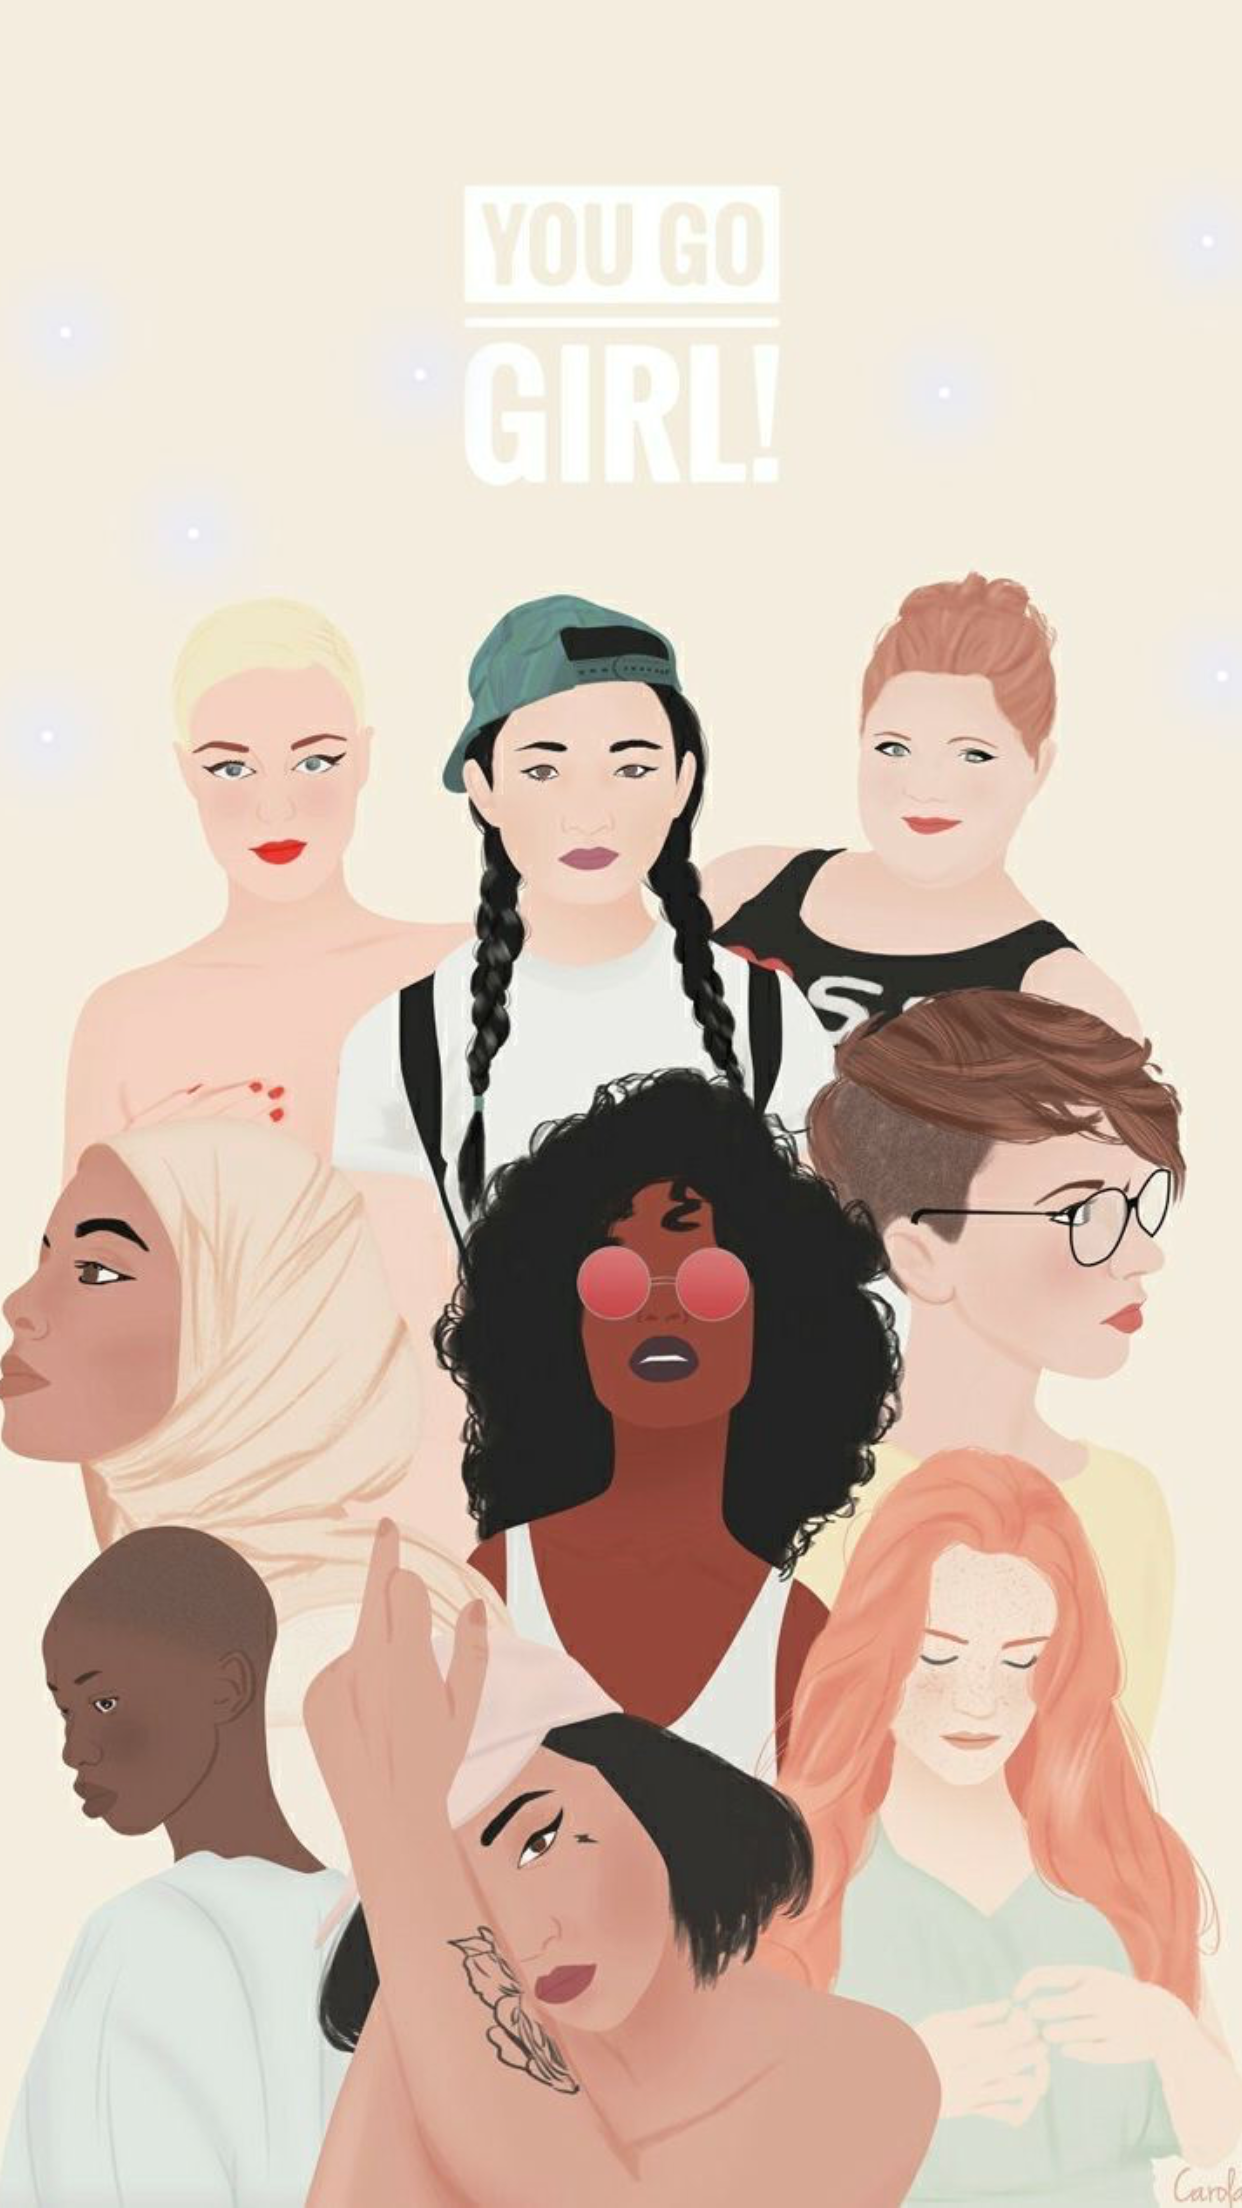 Pin by Miranda Estrada on Artwork II   Girl power art, Feminist ...